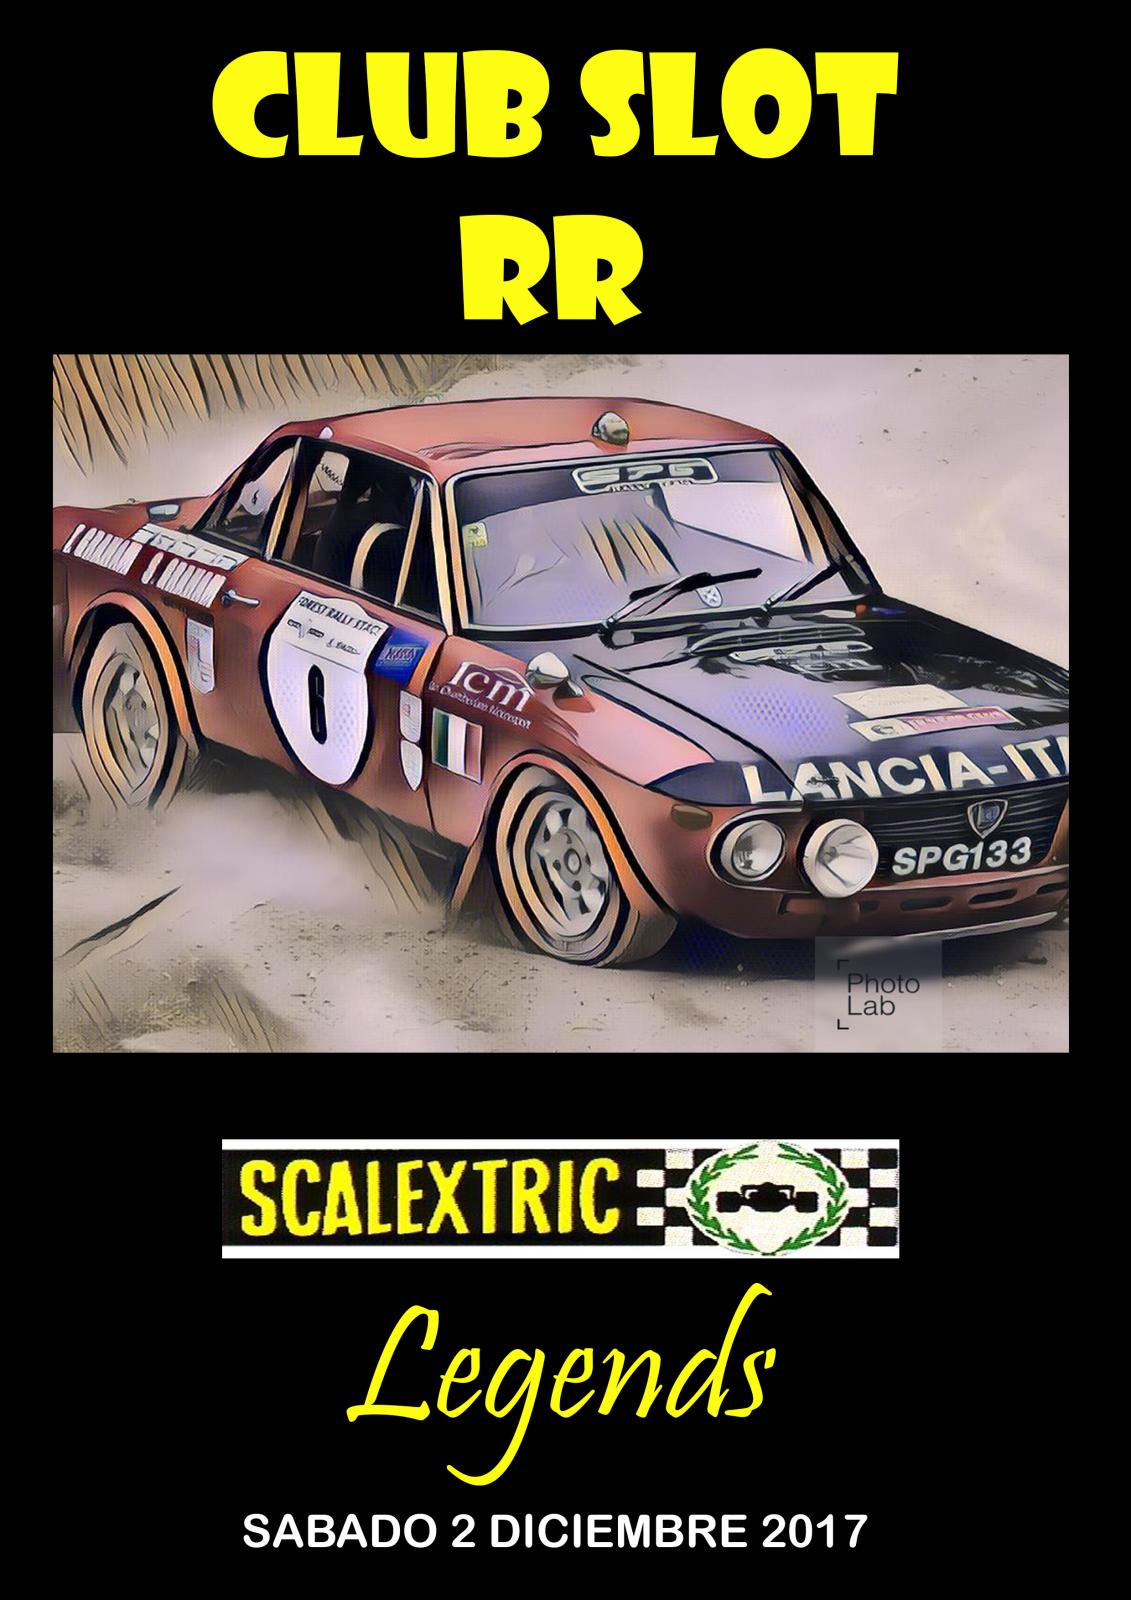 Club Scalextric-Slot RR - Portal Zl5jpk